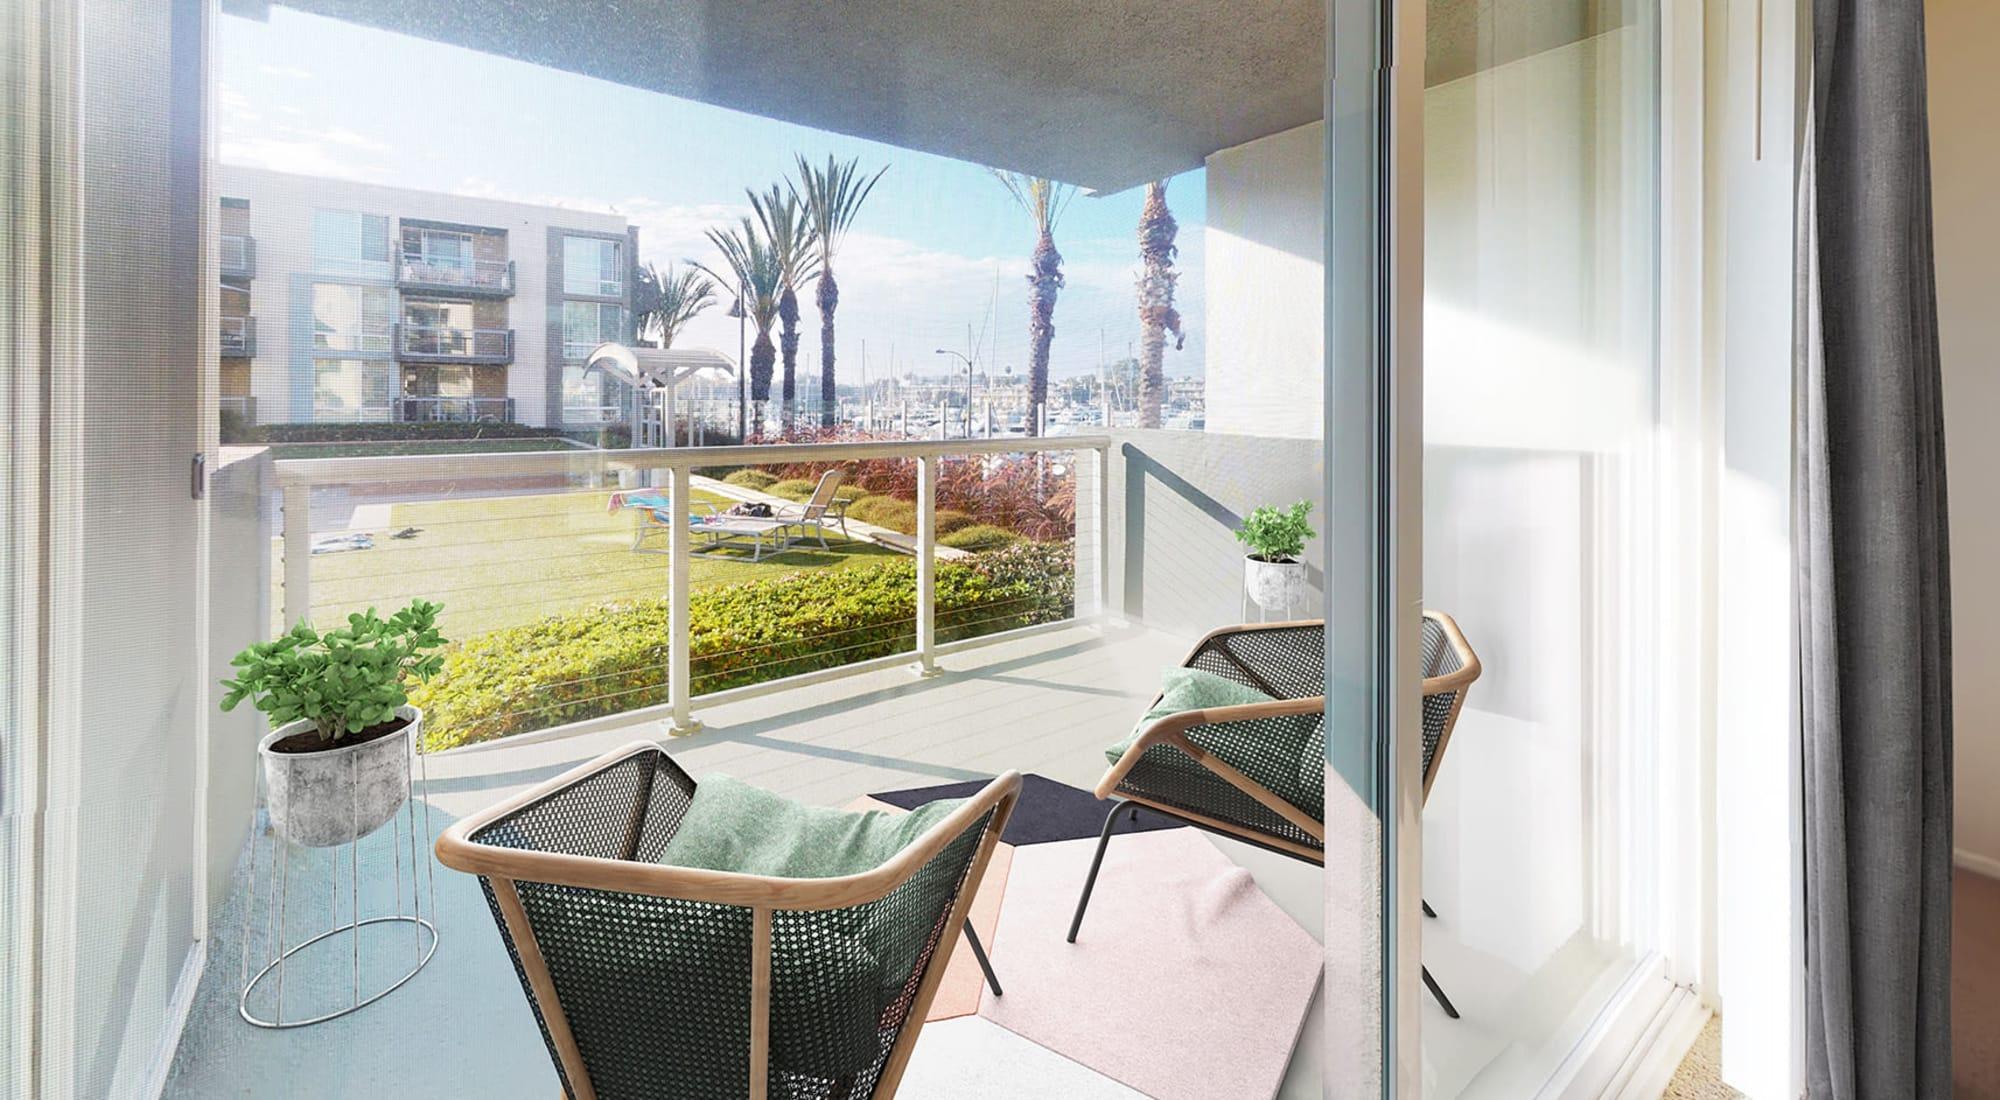 Balcony with views of the marina from a luxury home at Waters Edge at Marina Harbor in Marina Del Rey, California